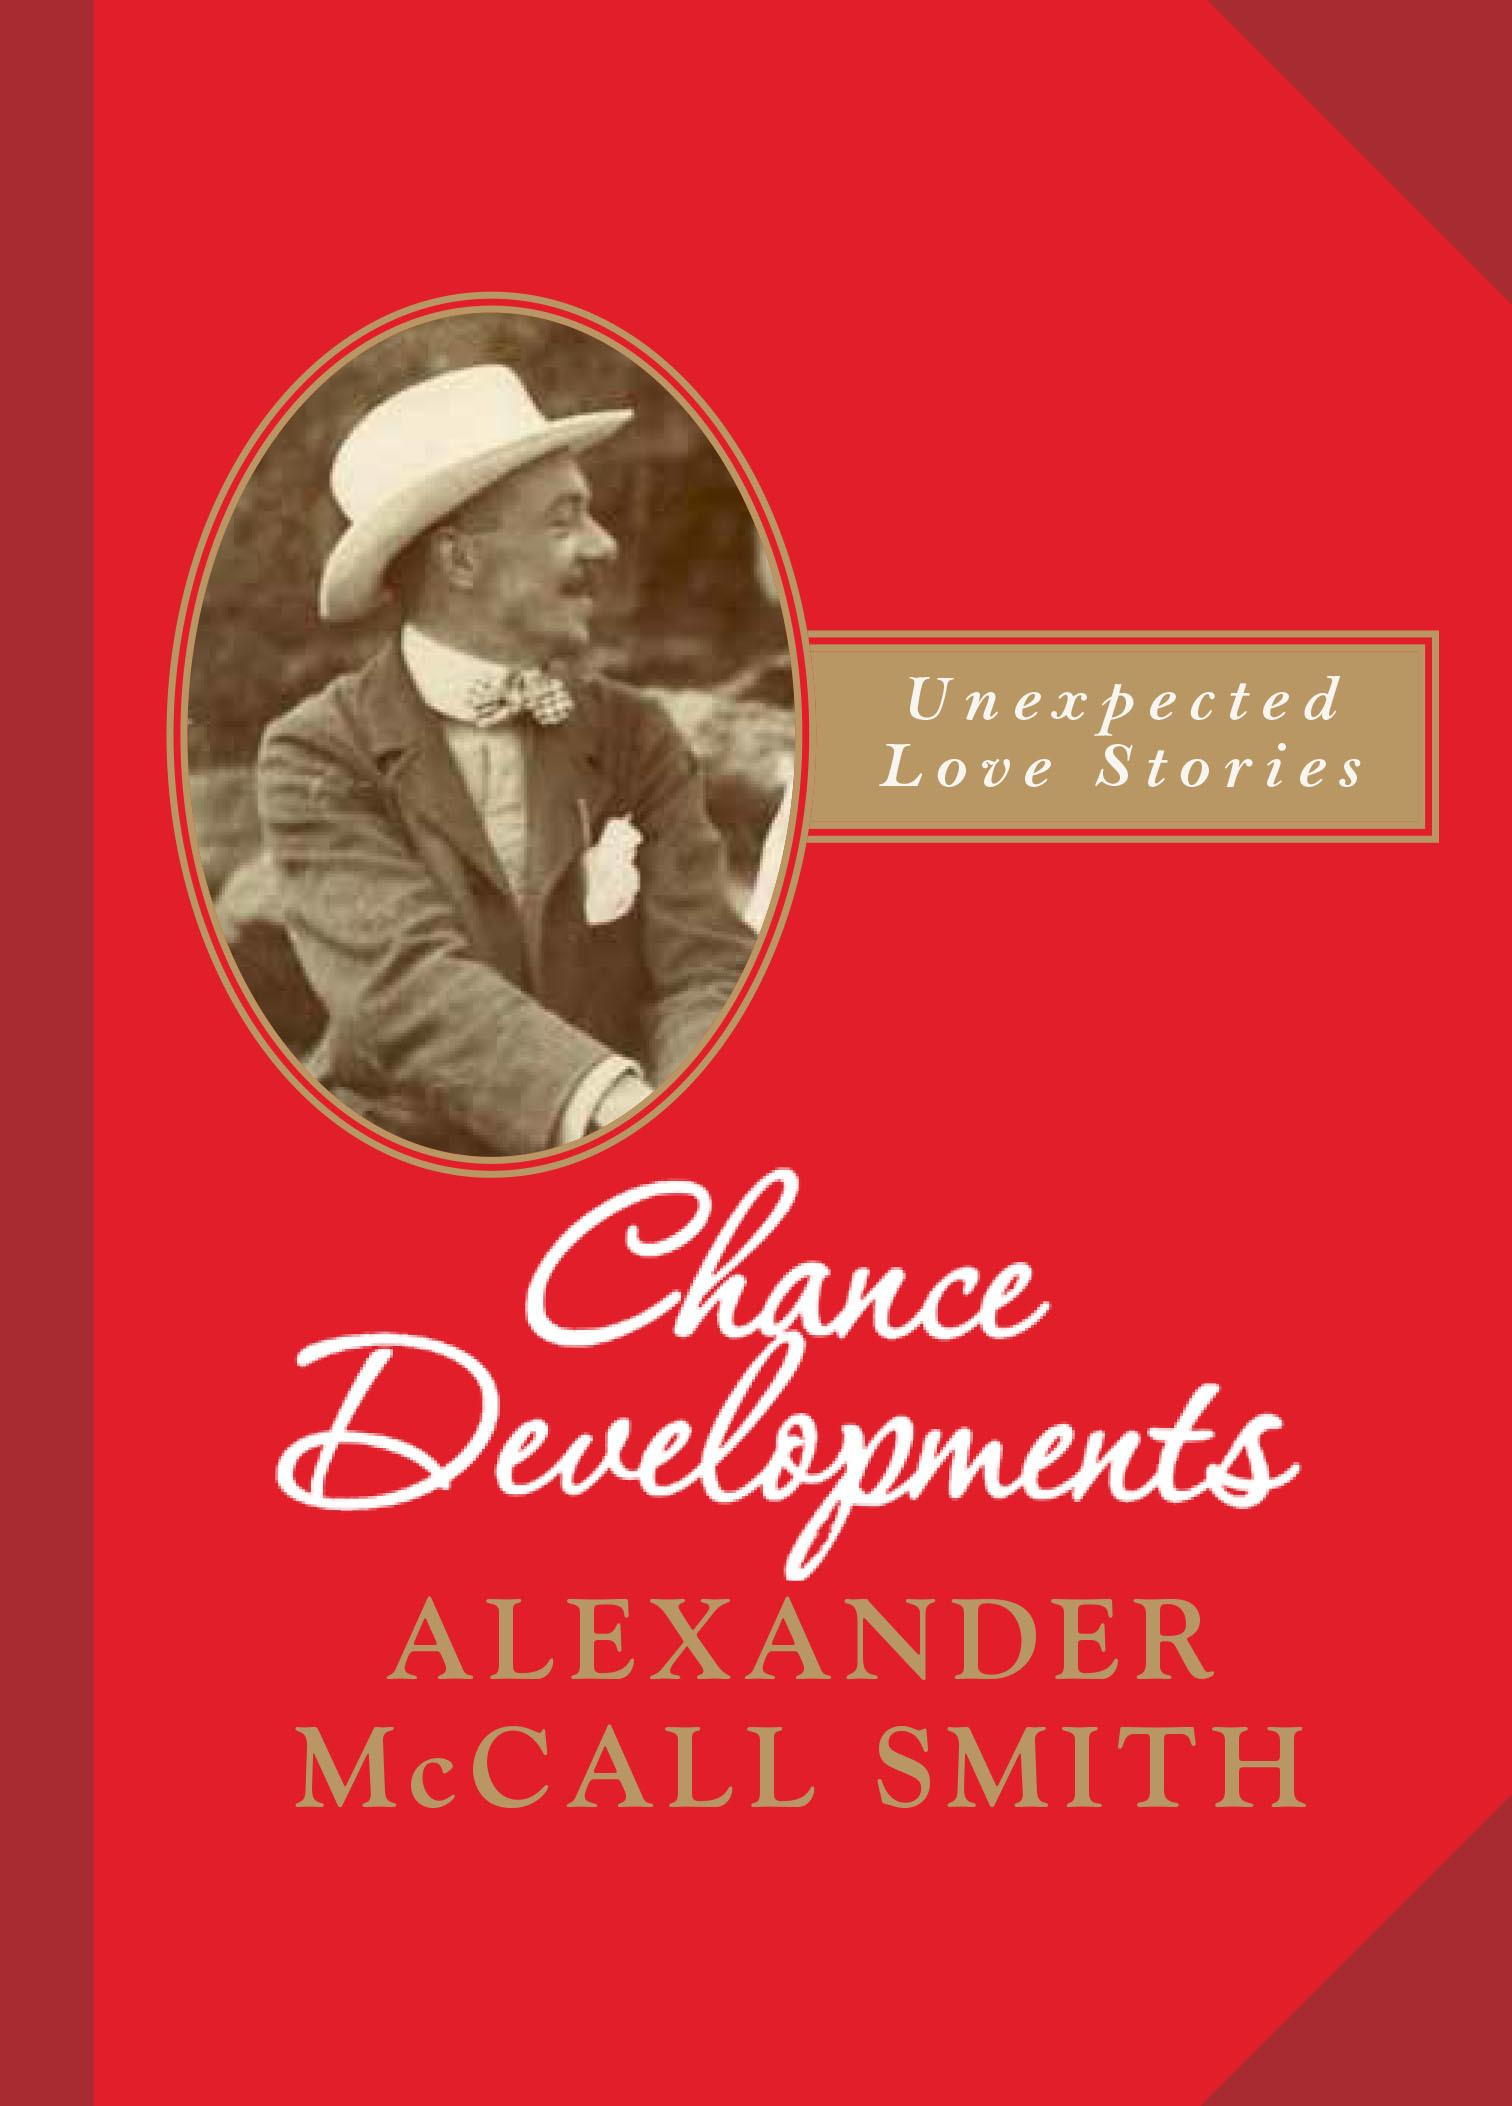 Chance Developments: Unexpected Love Stories